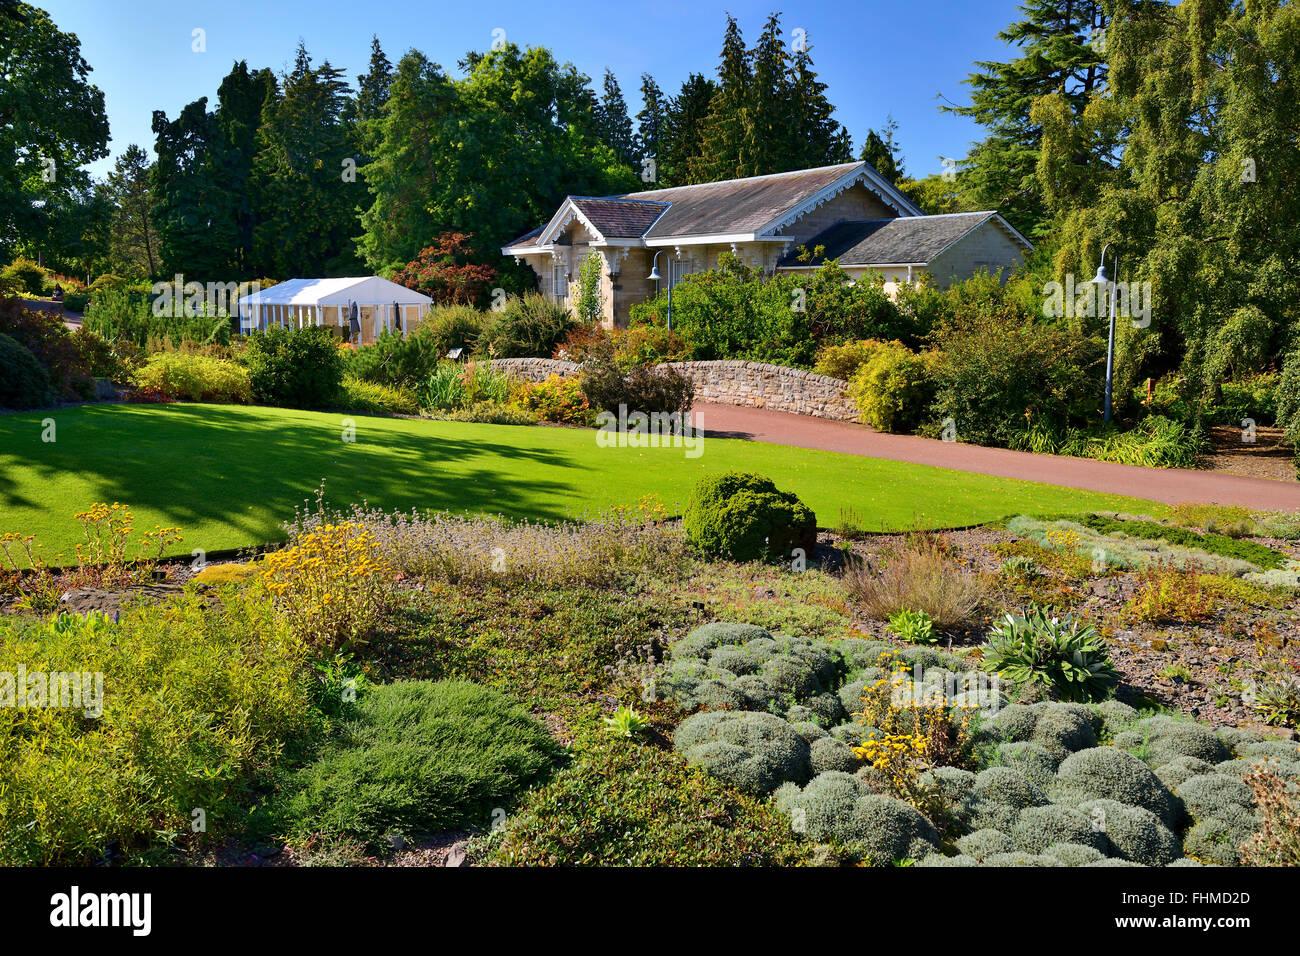 Caledonian Hall, Royal Botanic Garden, Edinburgh, Scotland, UK - Stock Image